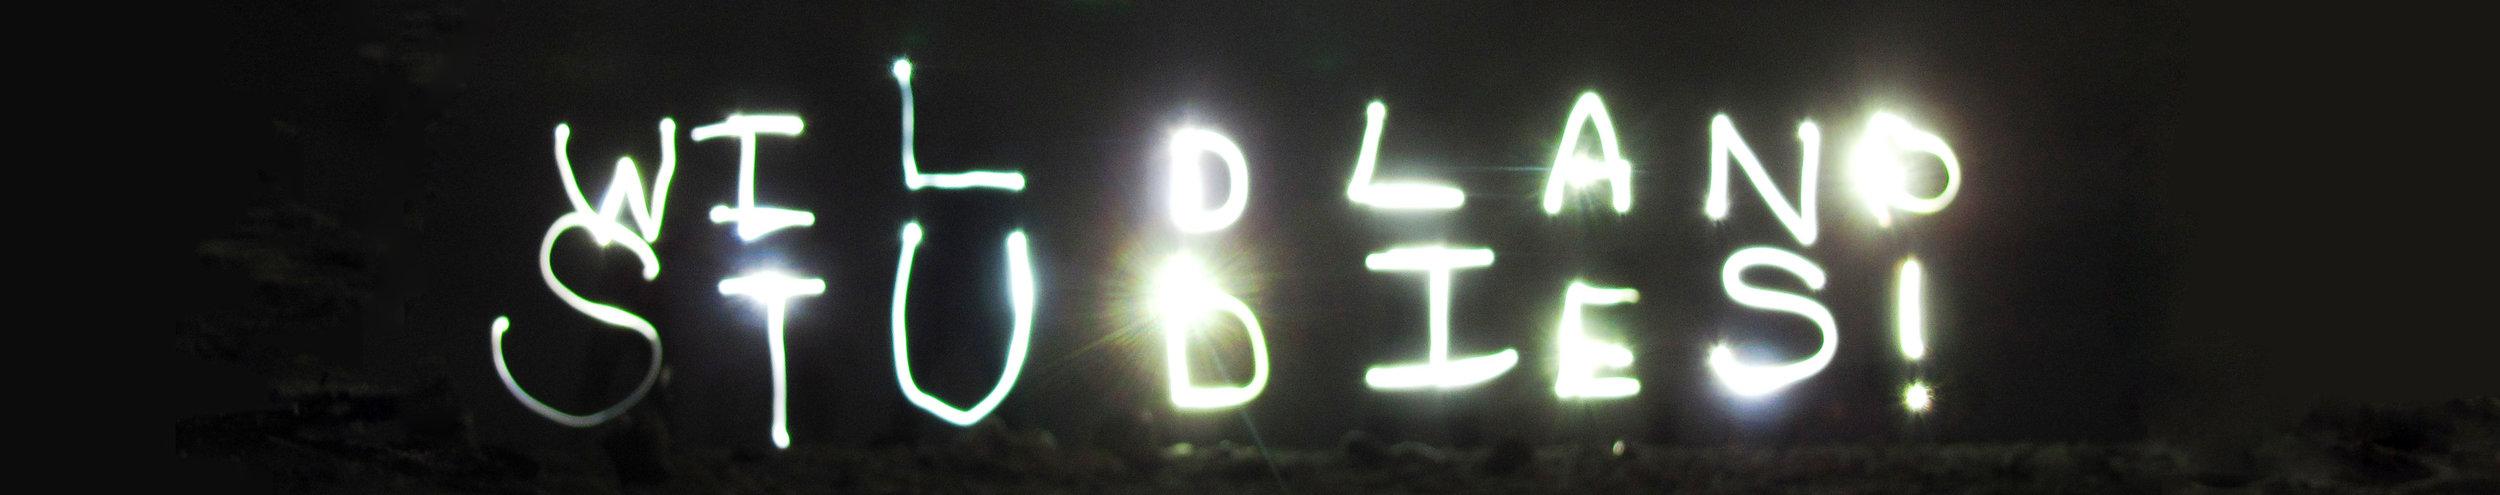 WS slice 2 New Zealand light up.jpg